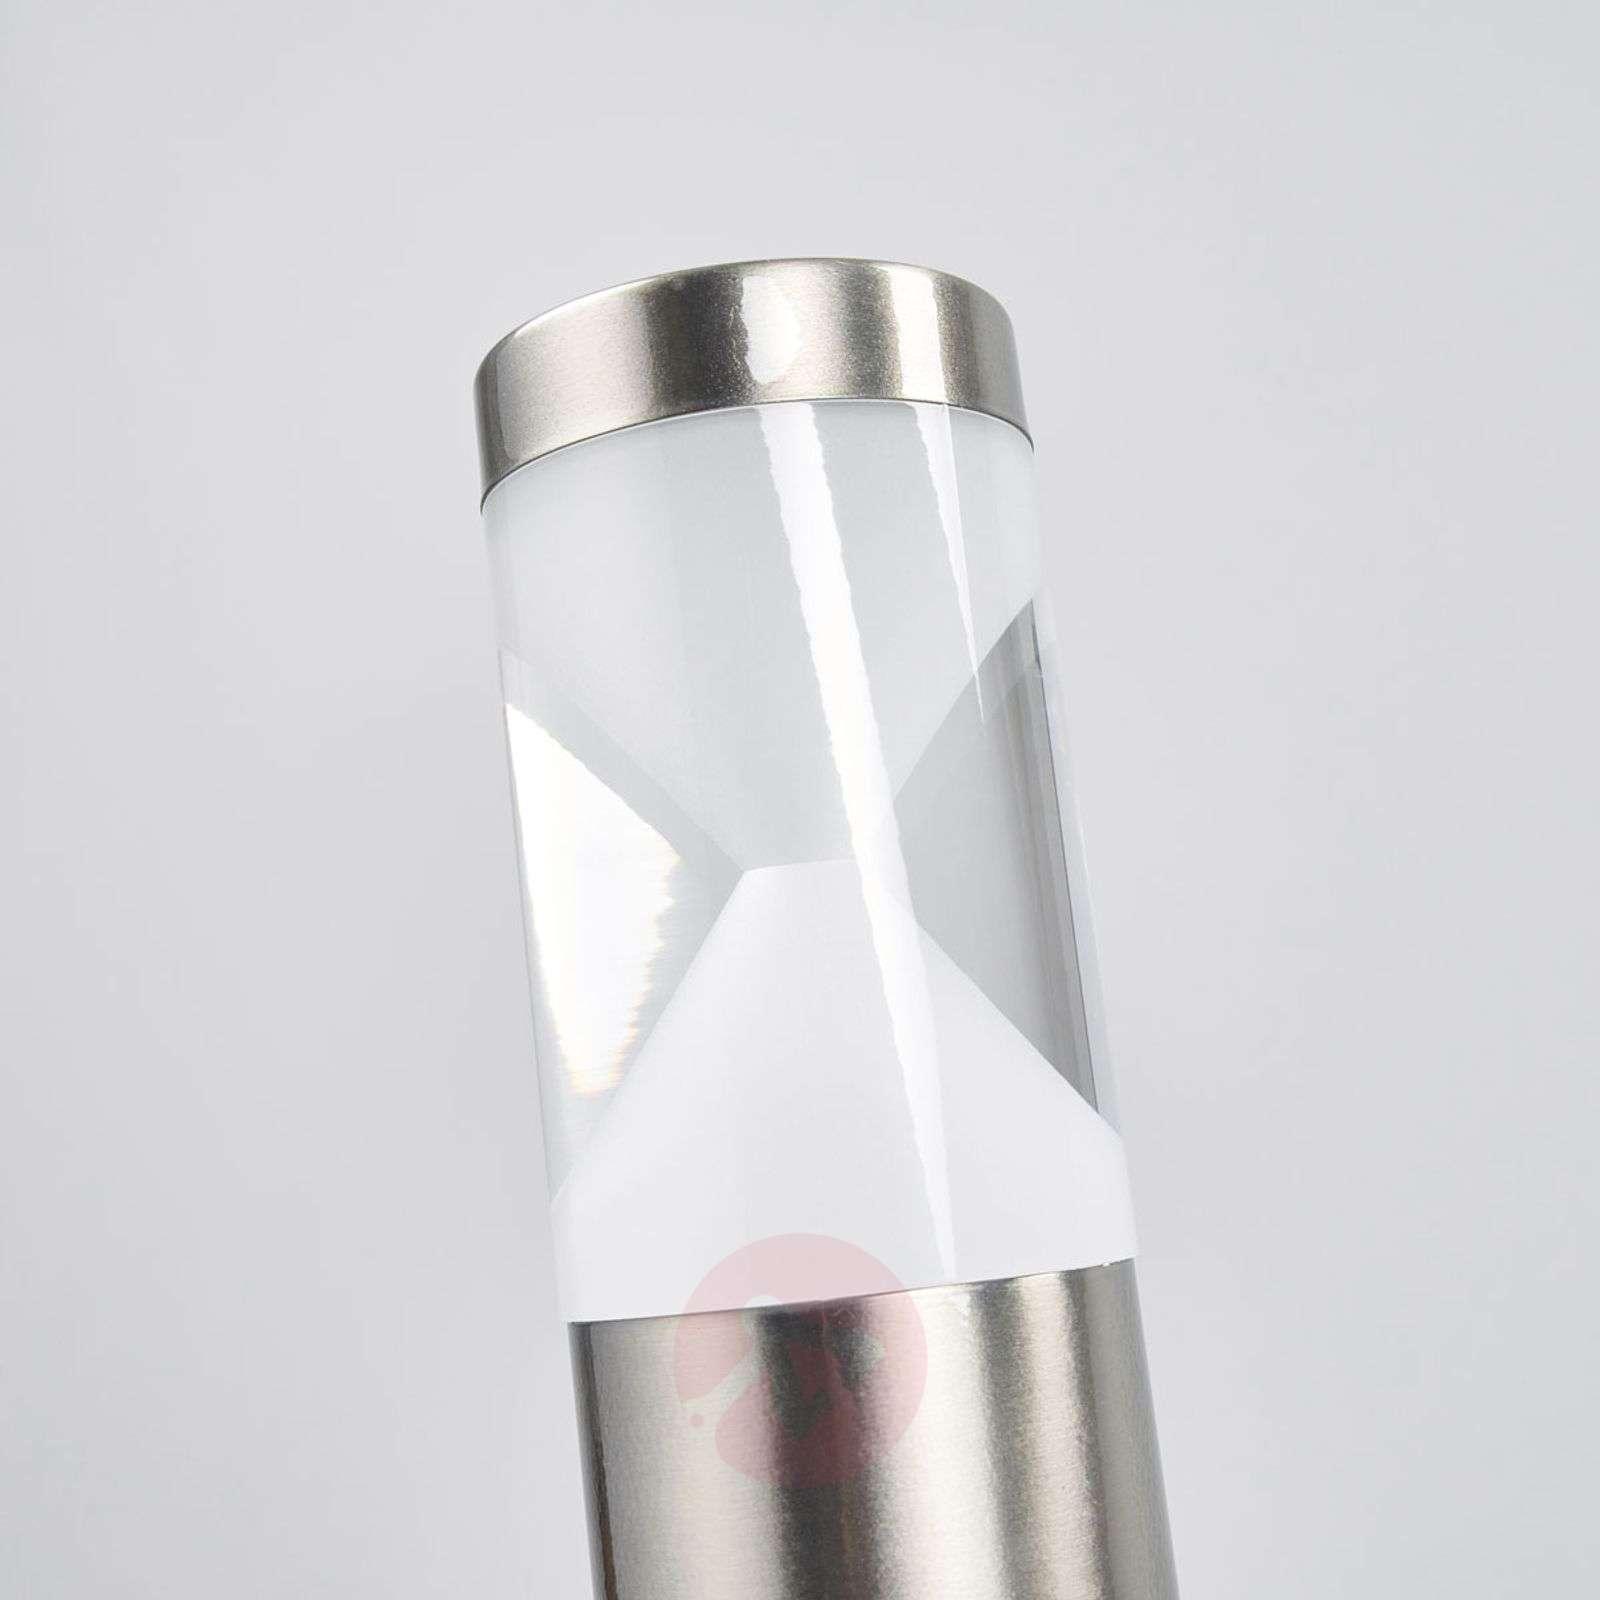 Fabrizio bollard lamp with LEDs and motion sensor-9988156-01